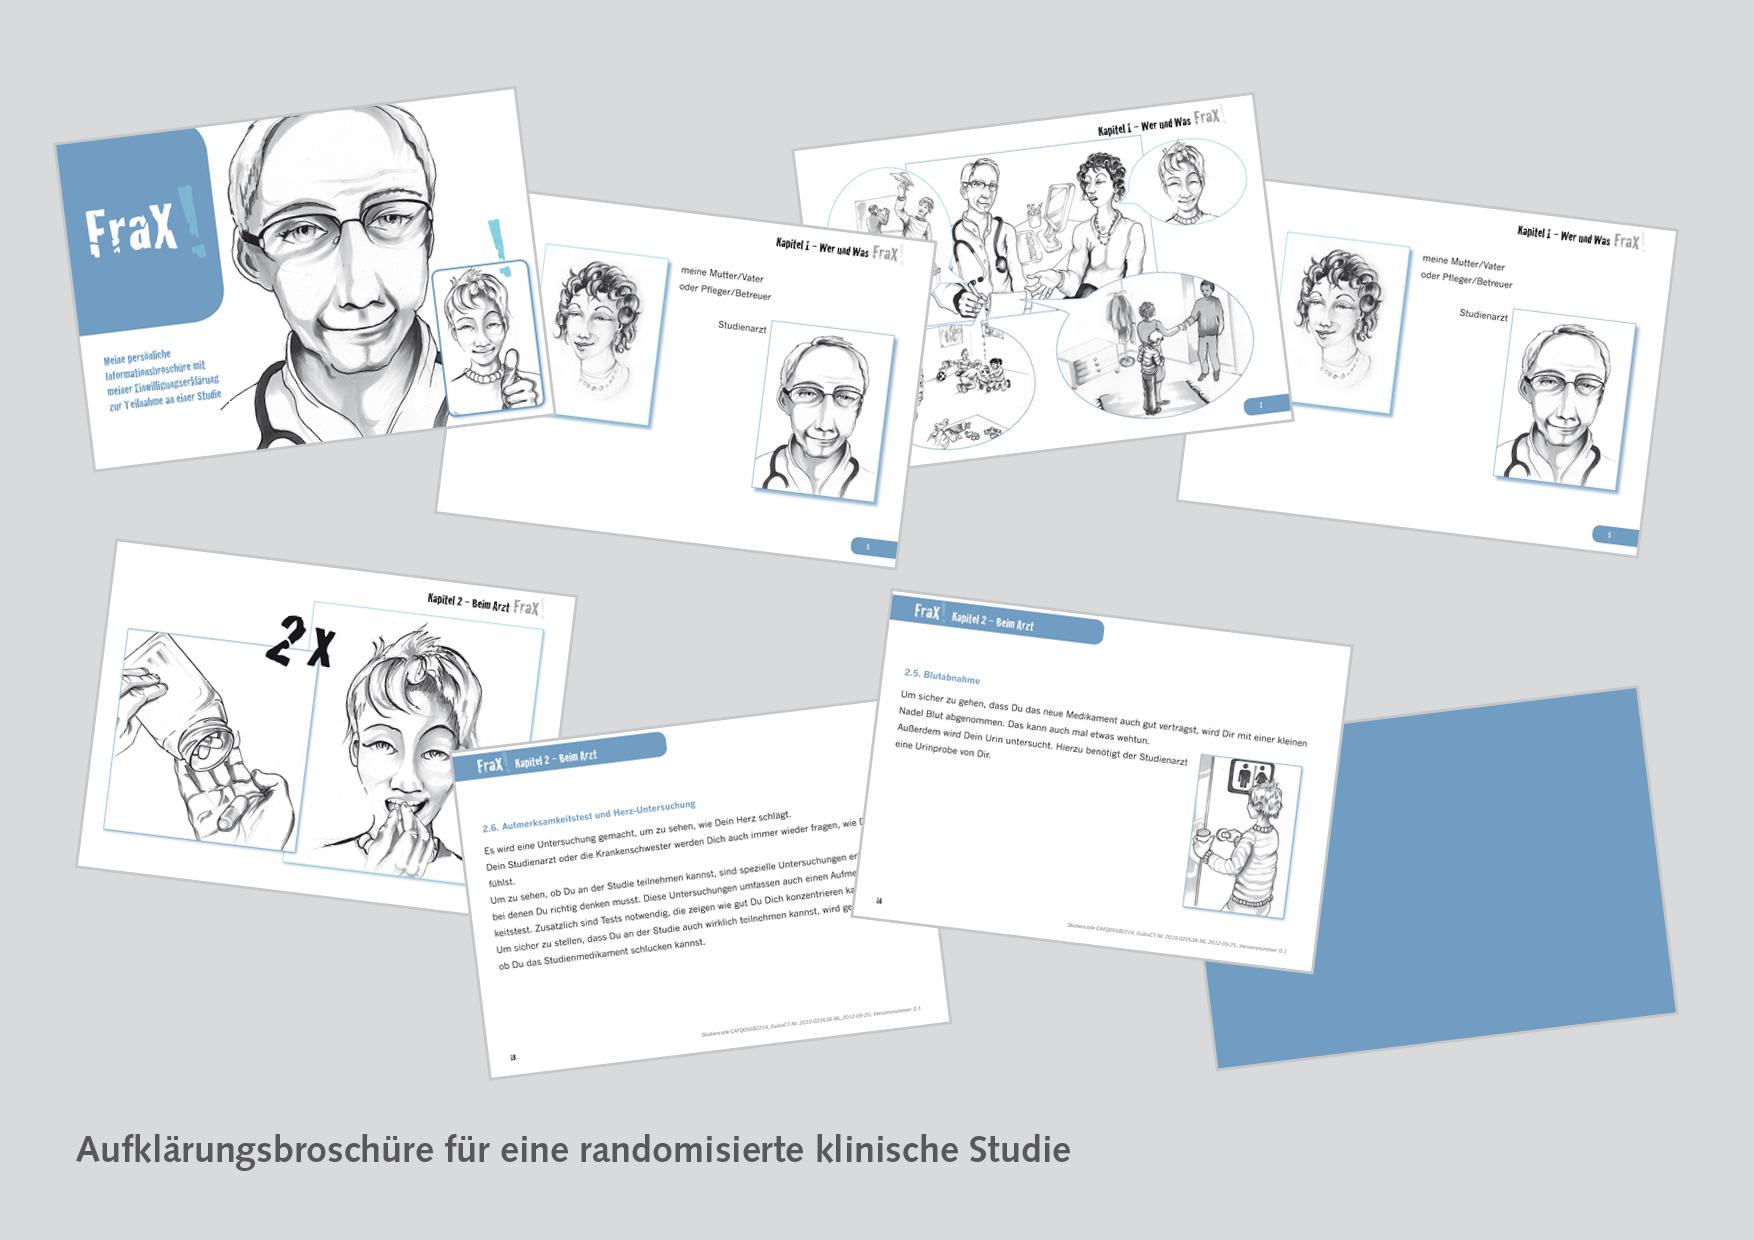 Artist Kommunikations GmbH